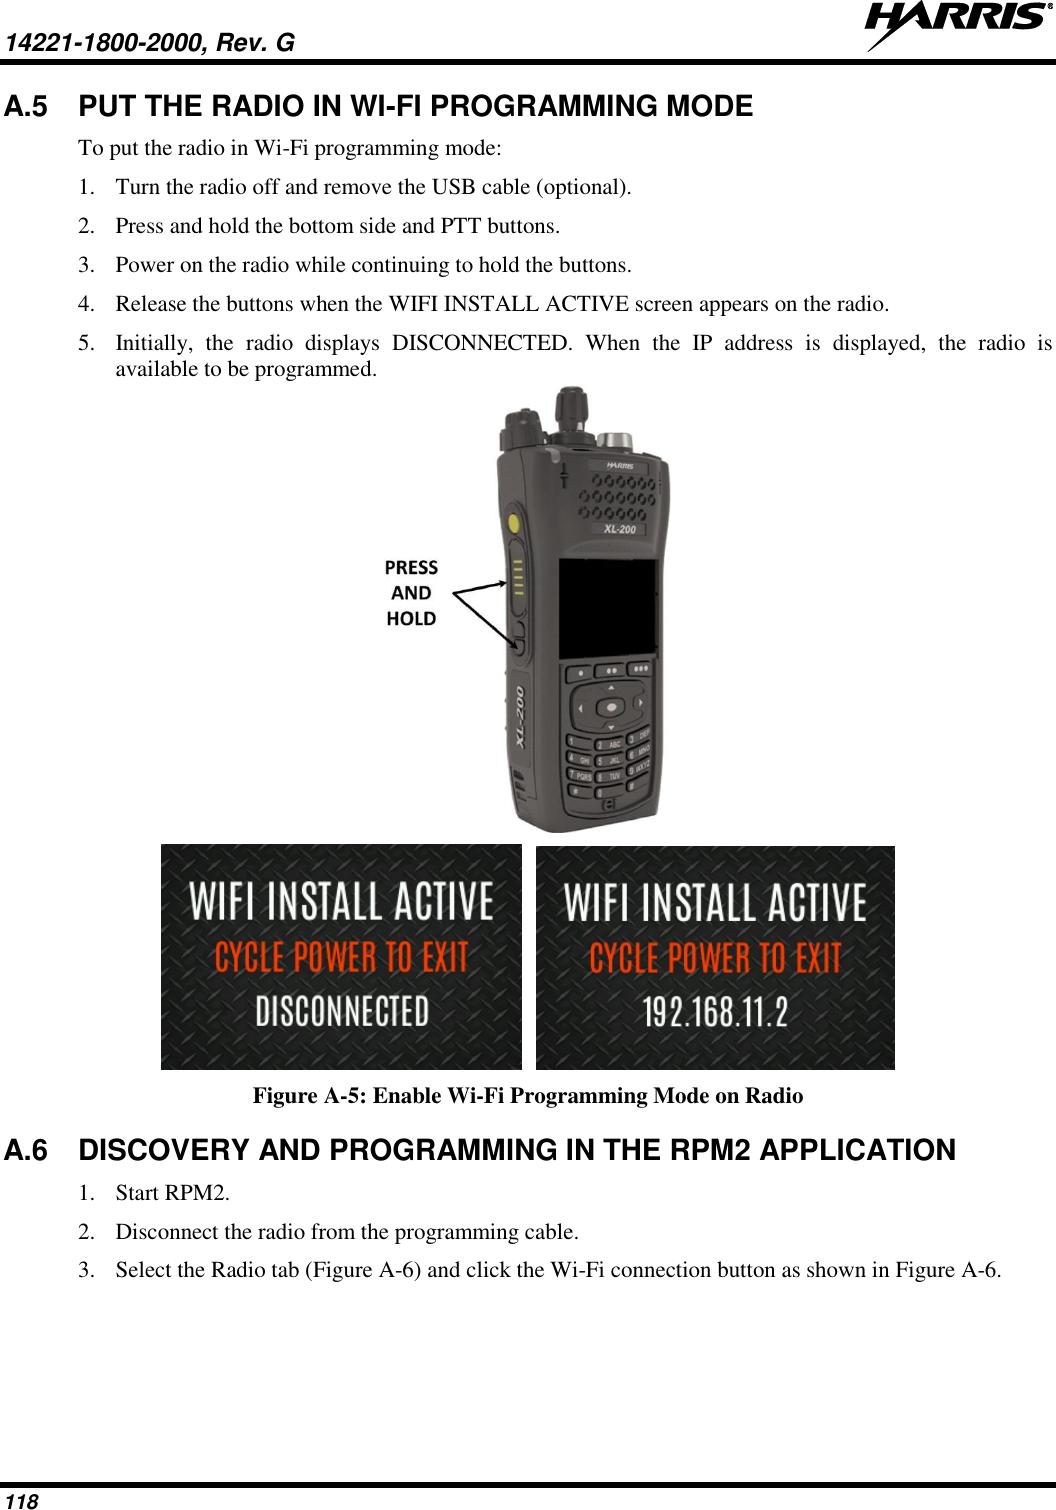 HARRIS TR-0146-E XL-200P C1D1, Multi-Band Portable Land Mobile Radio